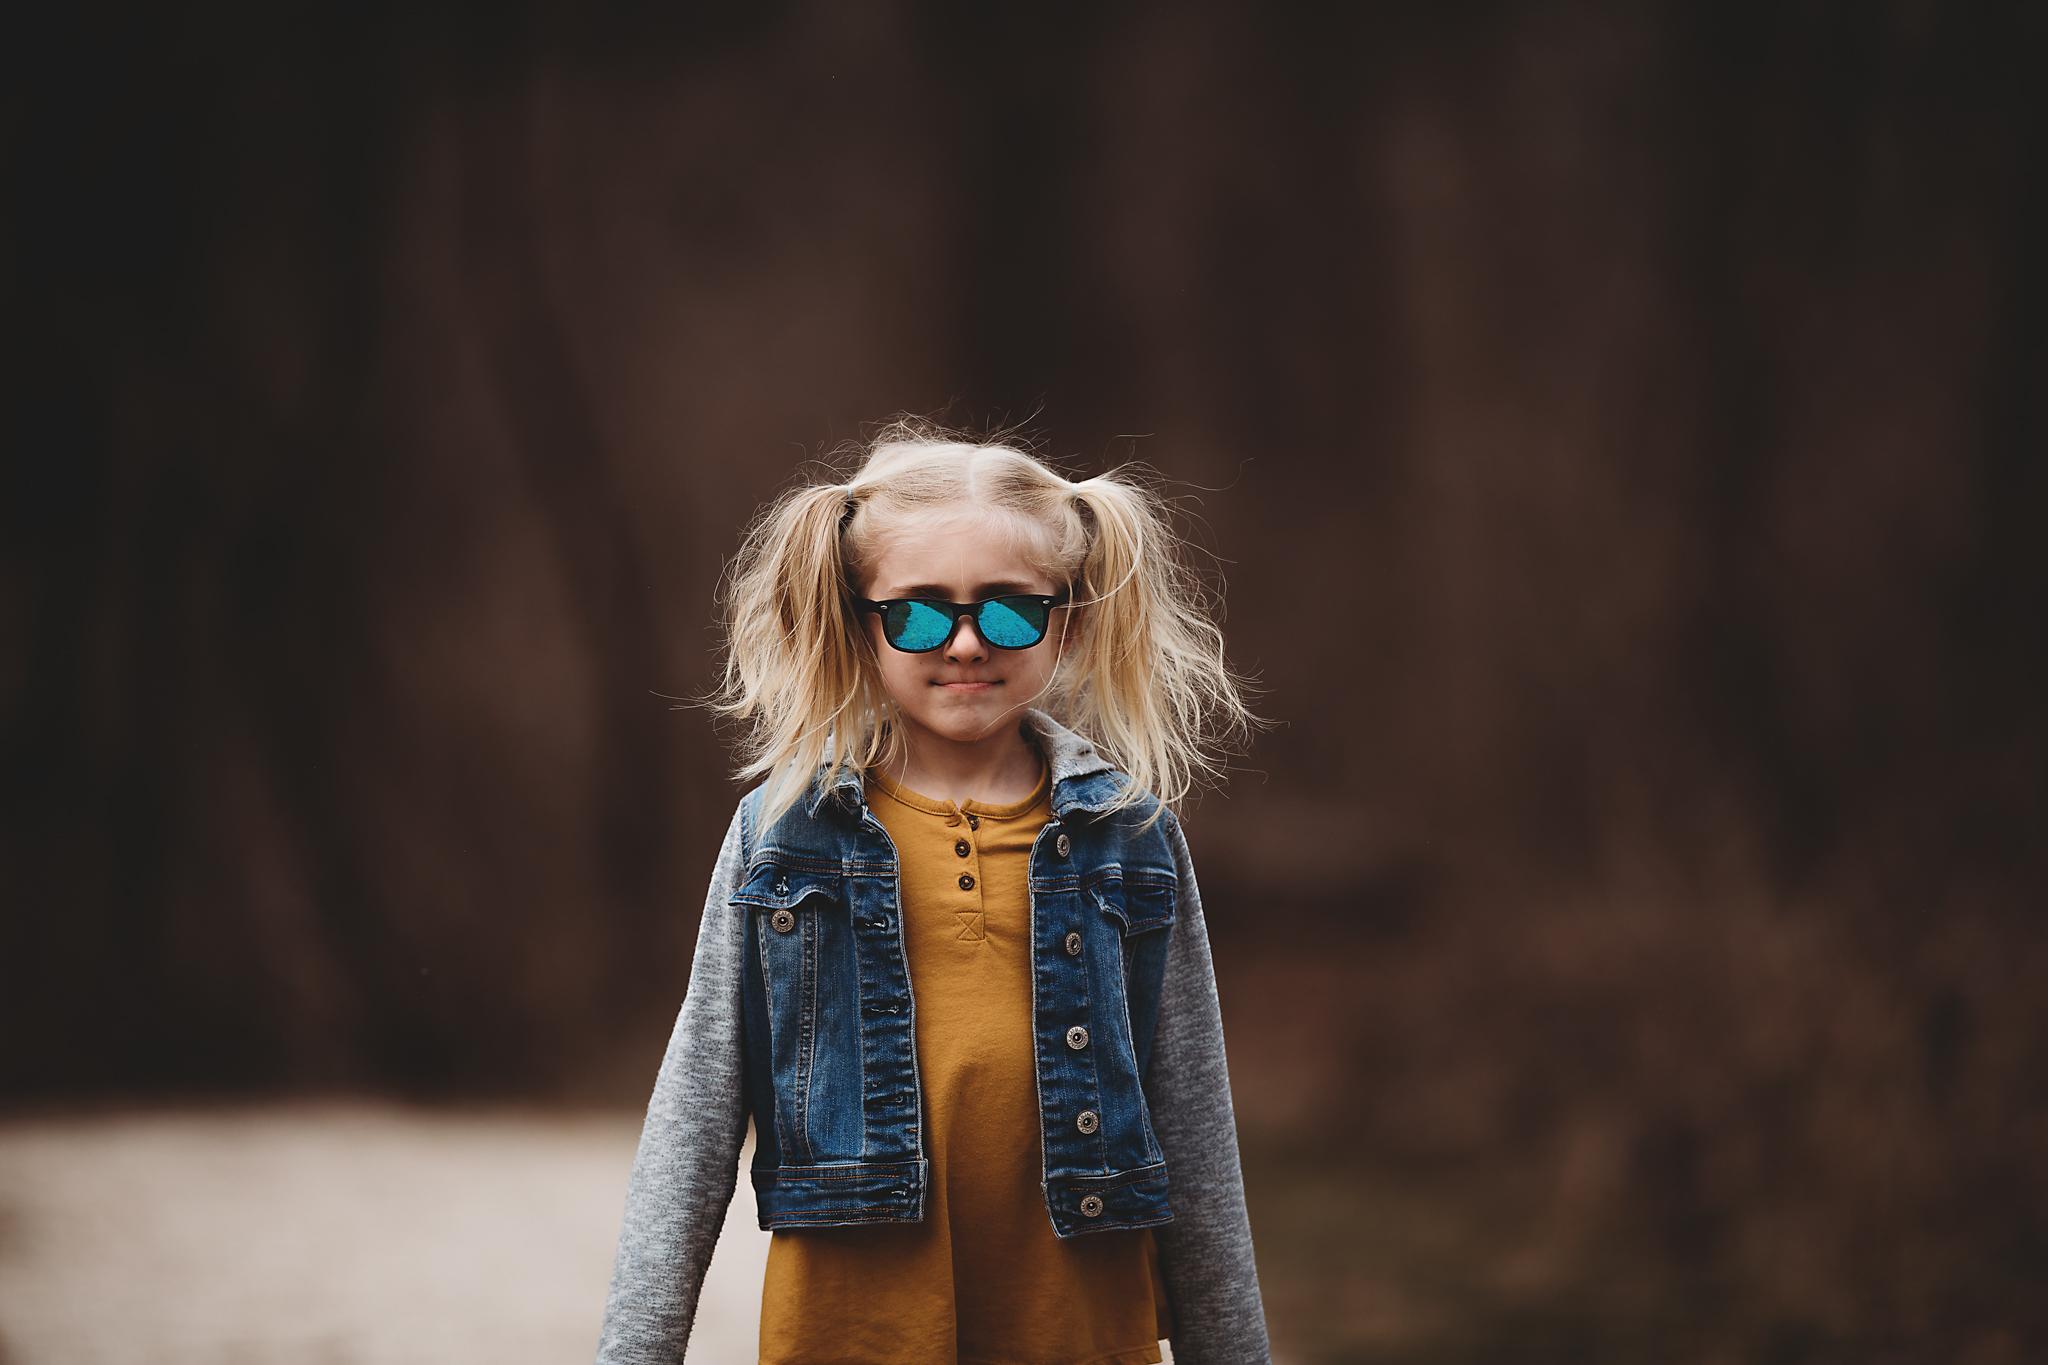 Long-island-photographer-hello-olivia-photography-children-kids-photos-new-york-lifestyle-portraits-suffolk-County-LI-60.jpg